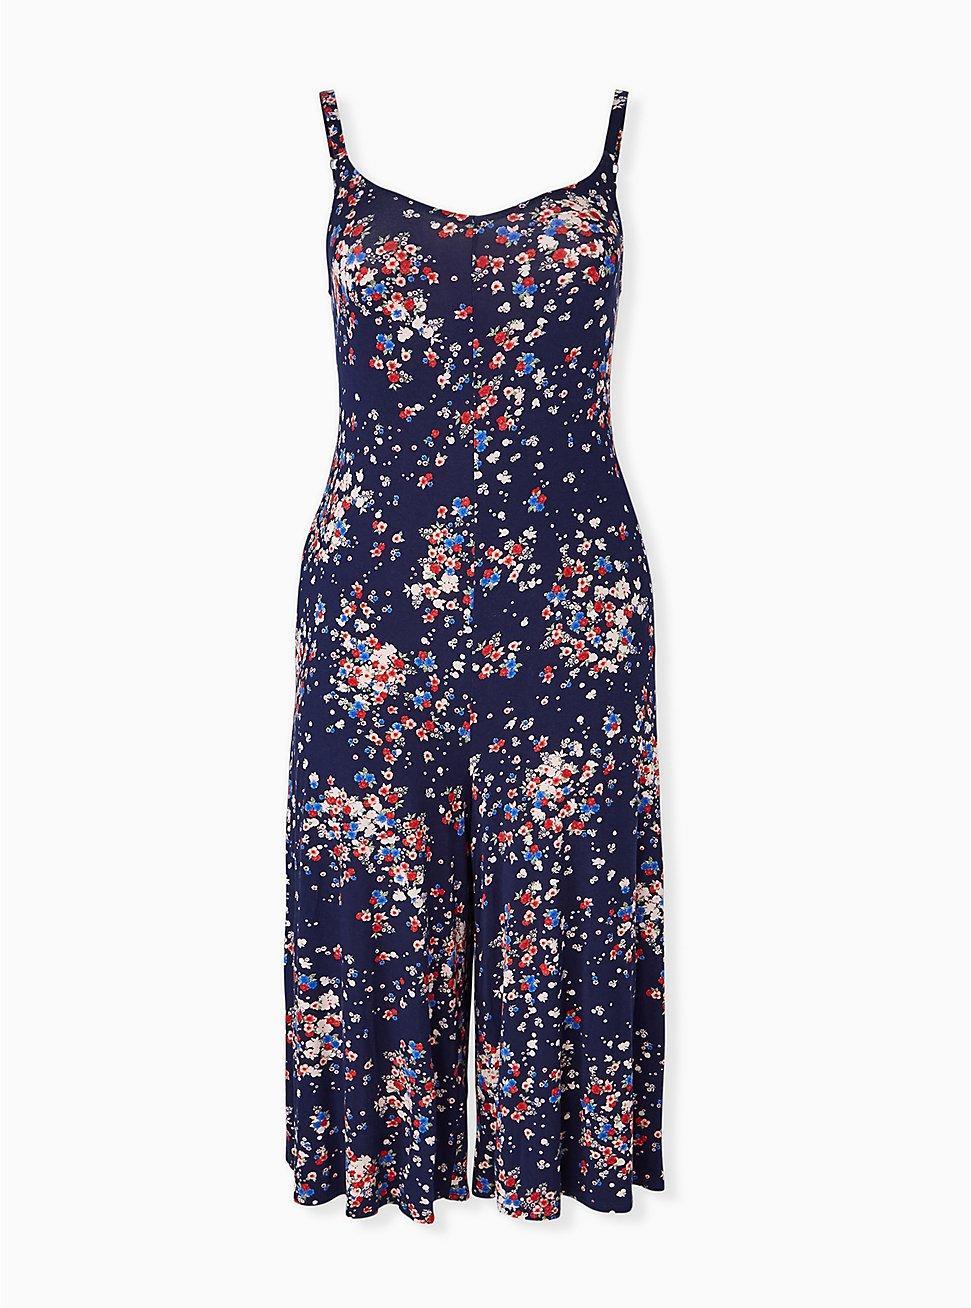 Super Soft Navy Ditsy Floral Culotte Jumpsuit, FLORAL - BLUE, hi-res